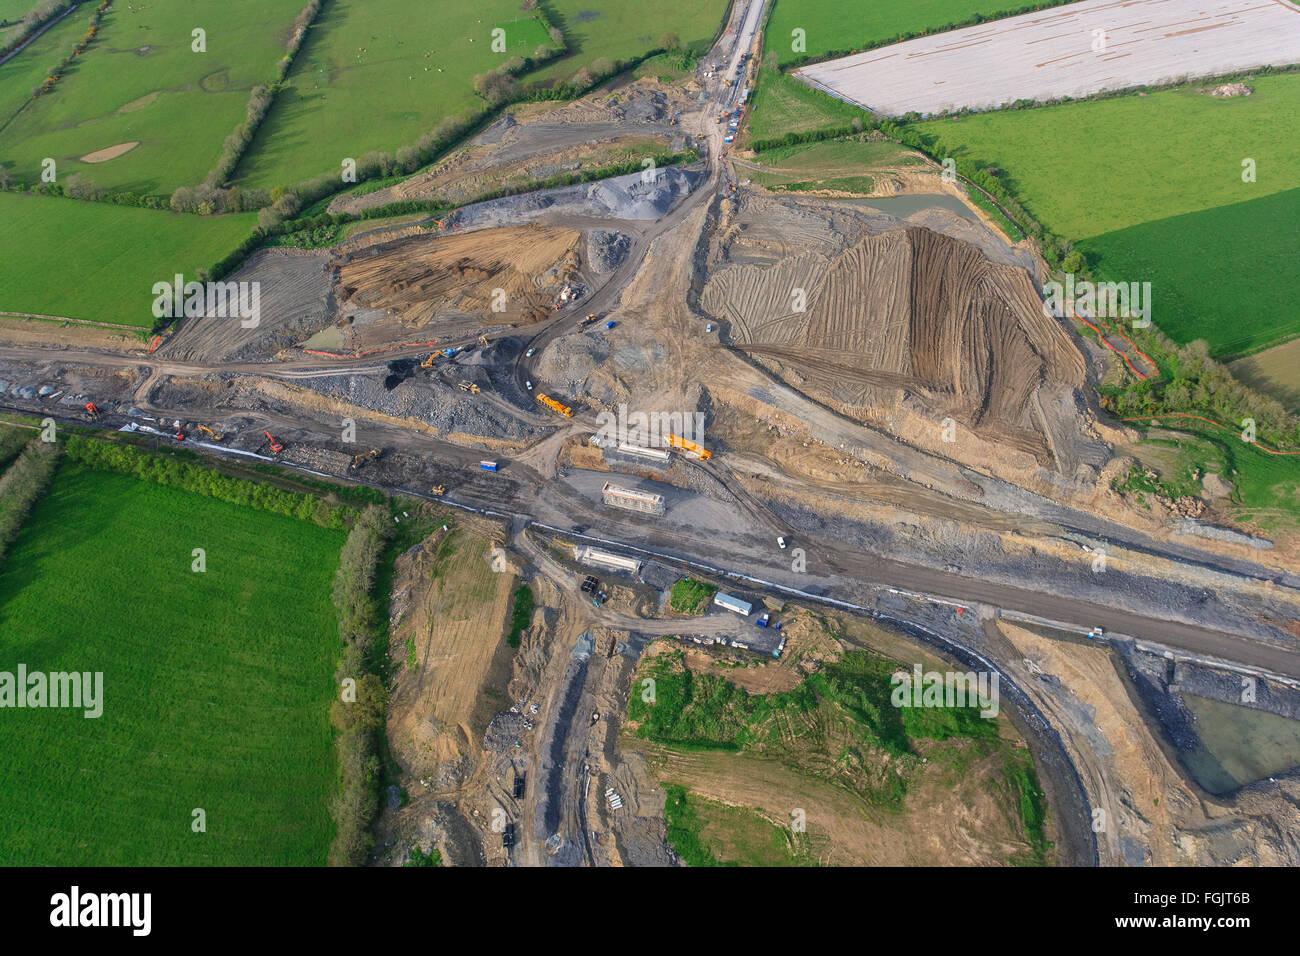 Straßeninfrastruktur Bau, Luftaufnahme Autobahn Straße im Bau uk Stockbild